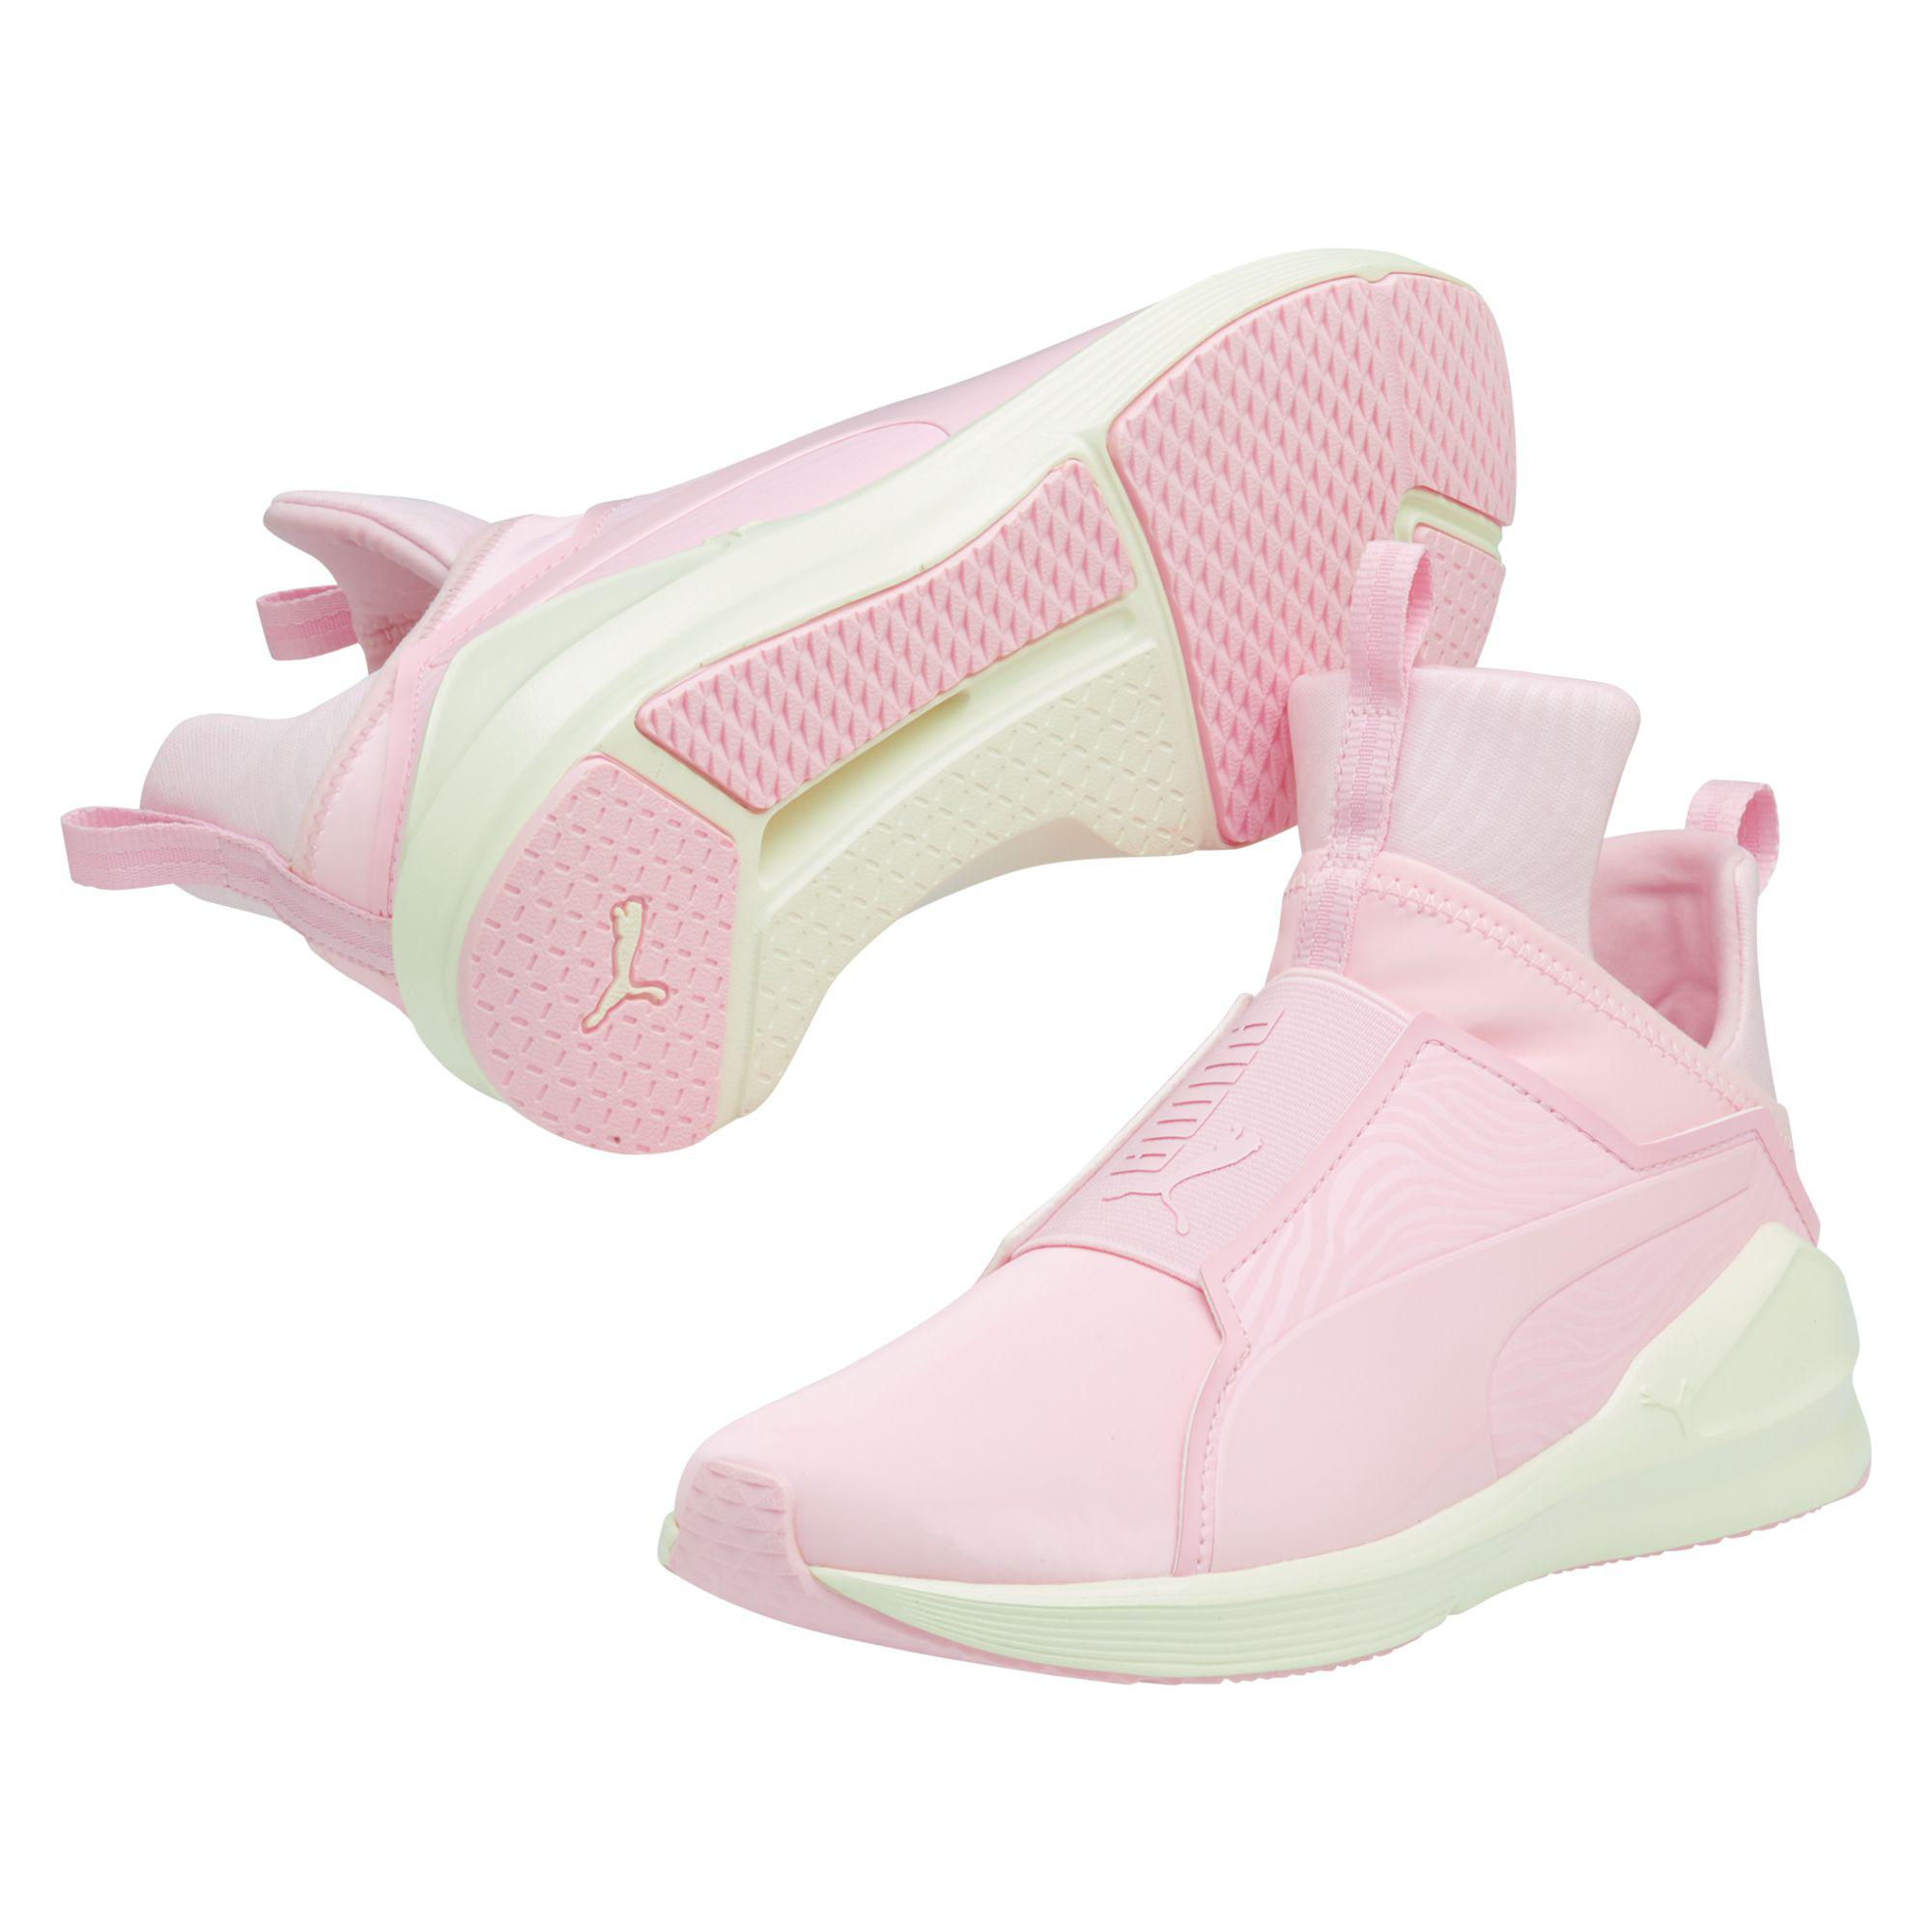 7b3d8f12ea05 Lyst - PUMA Fierce Muted Women s Training Shoes in Pink